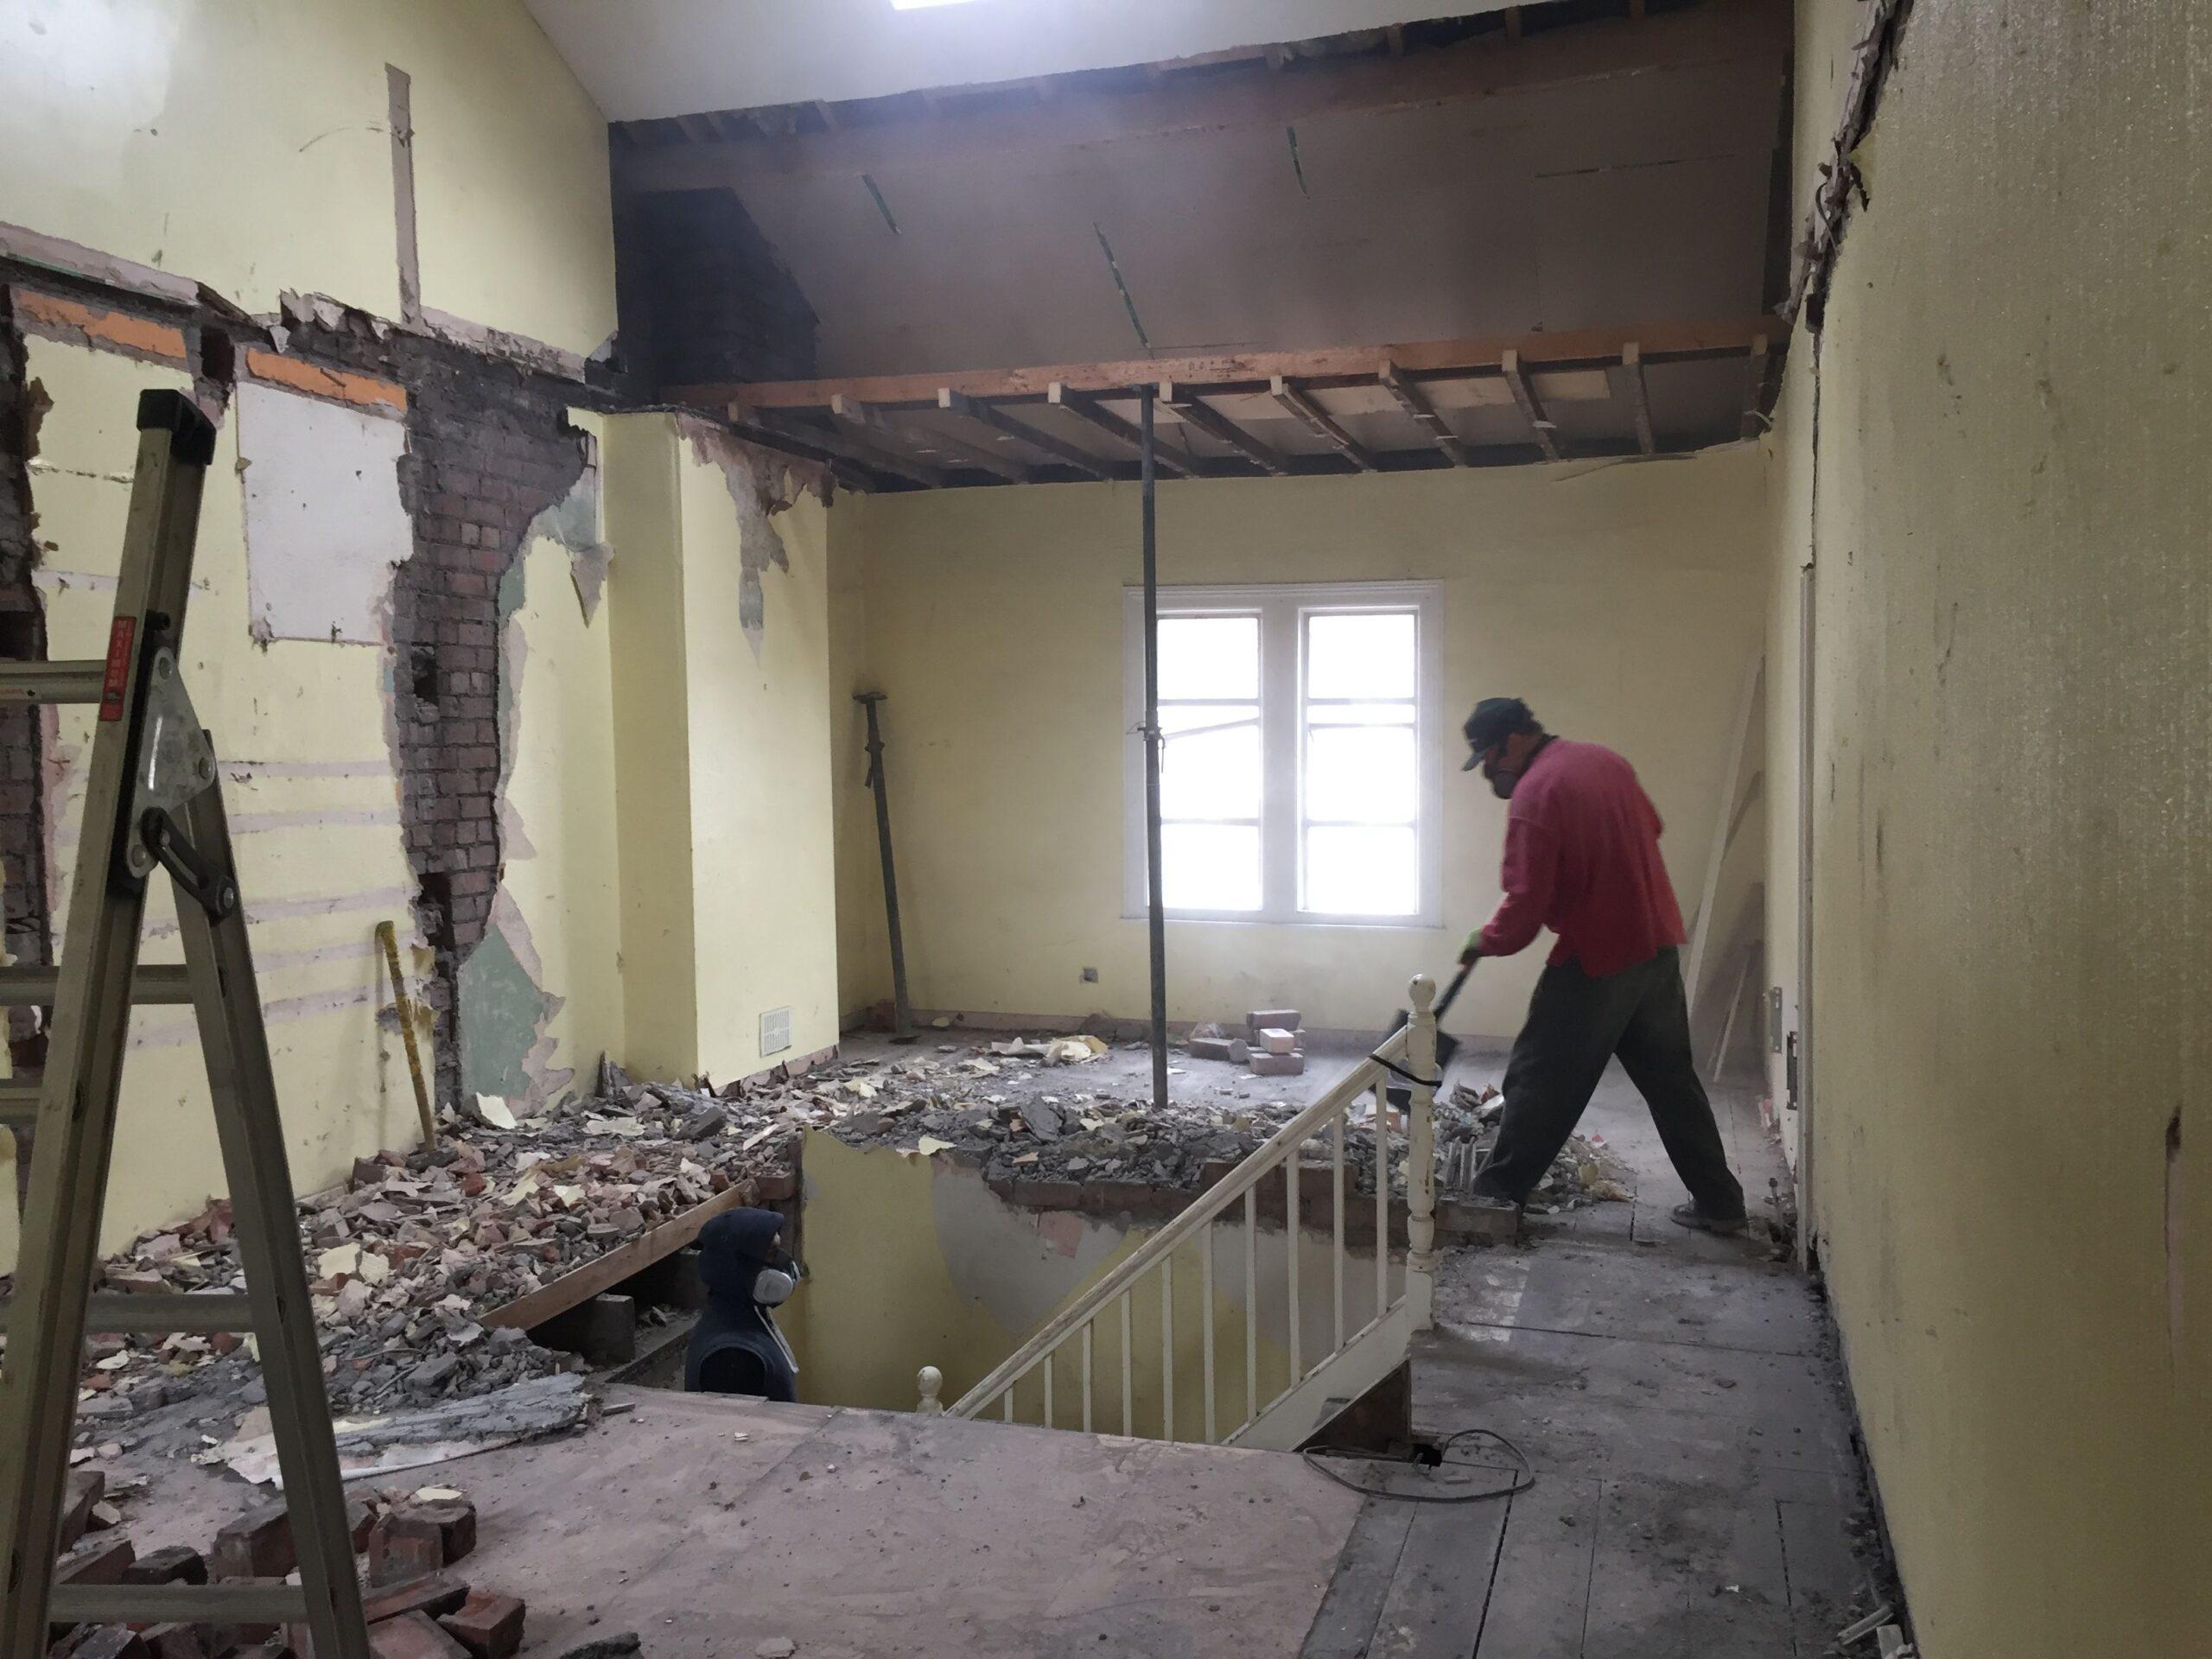 Dunkerry Road First Floor Landing Demolition Before